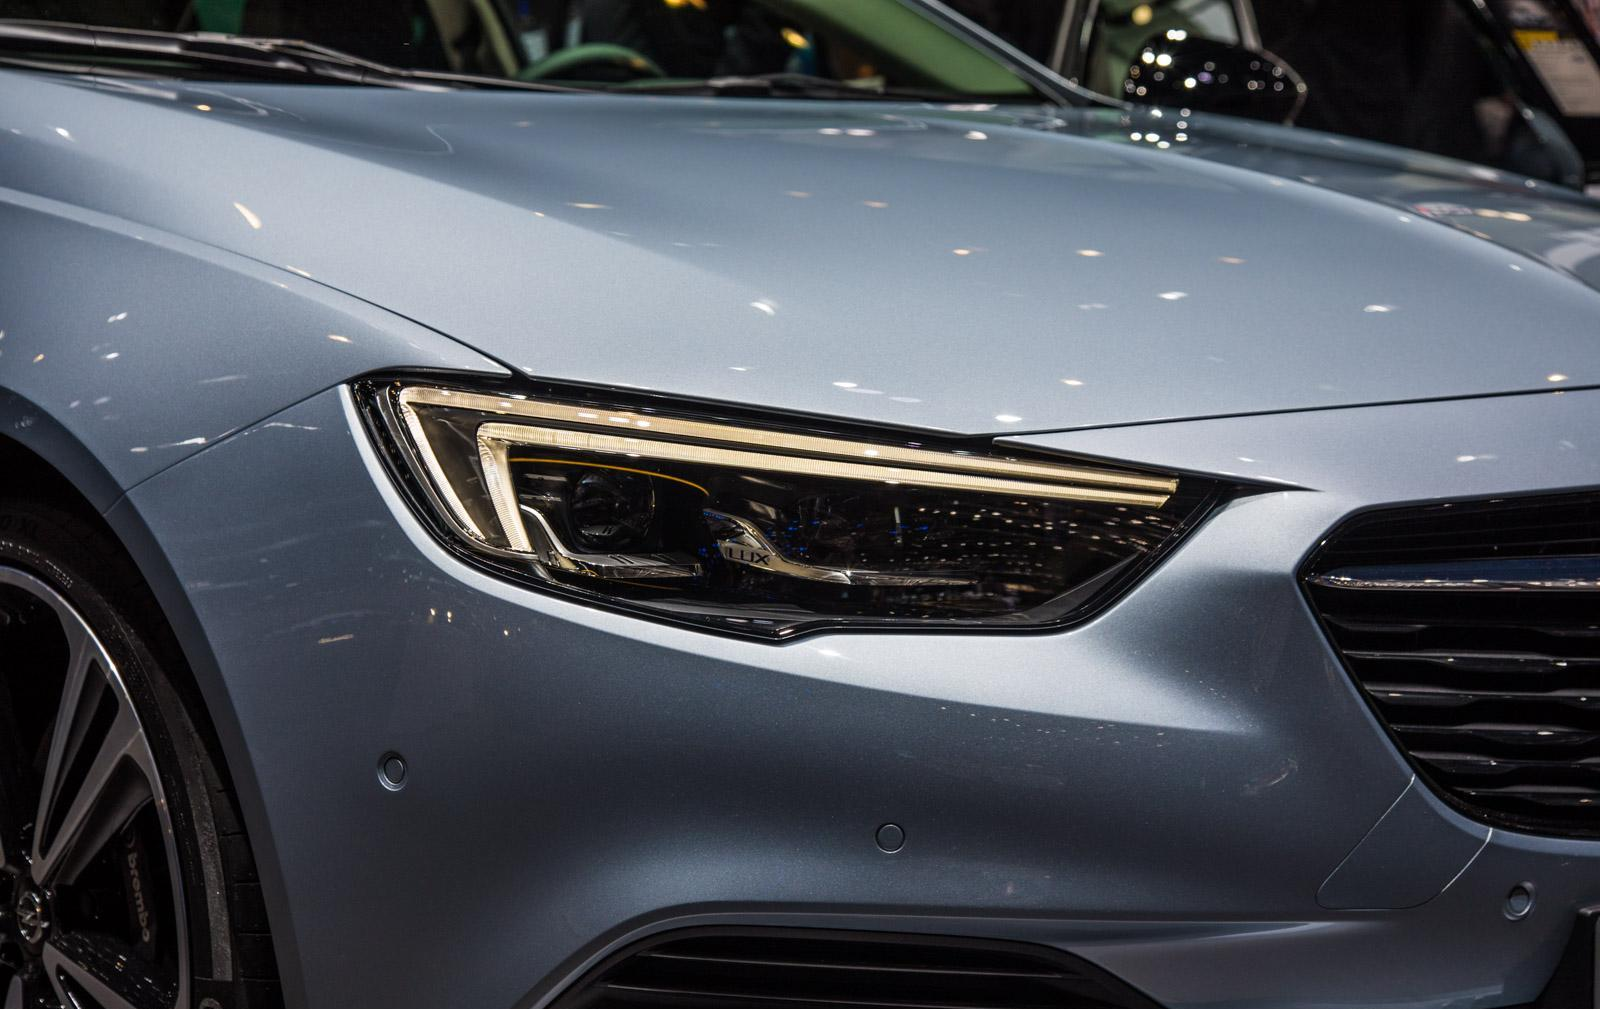 Opel-insignia-008